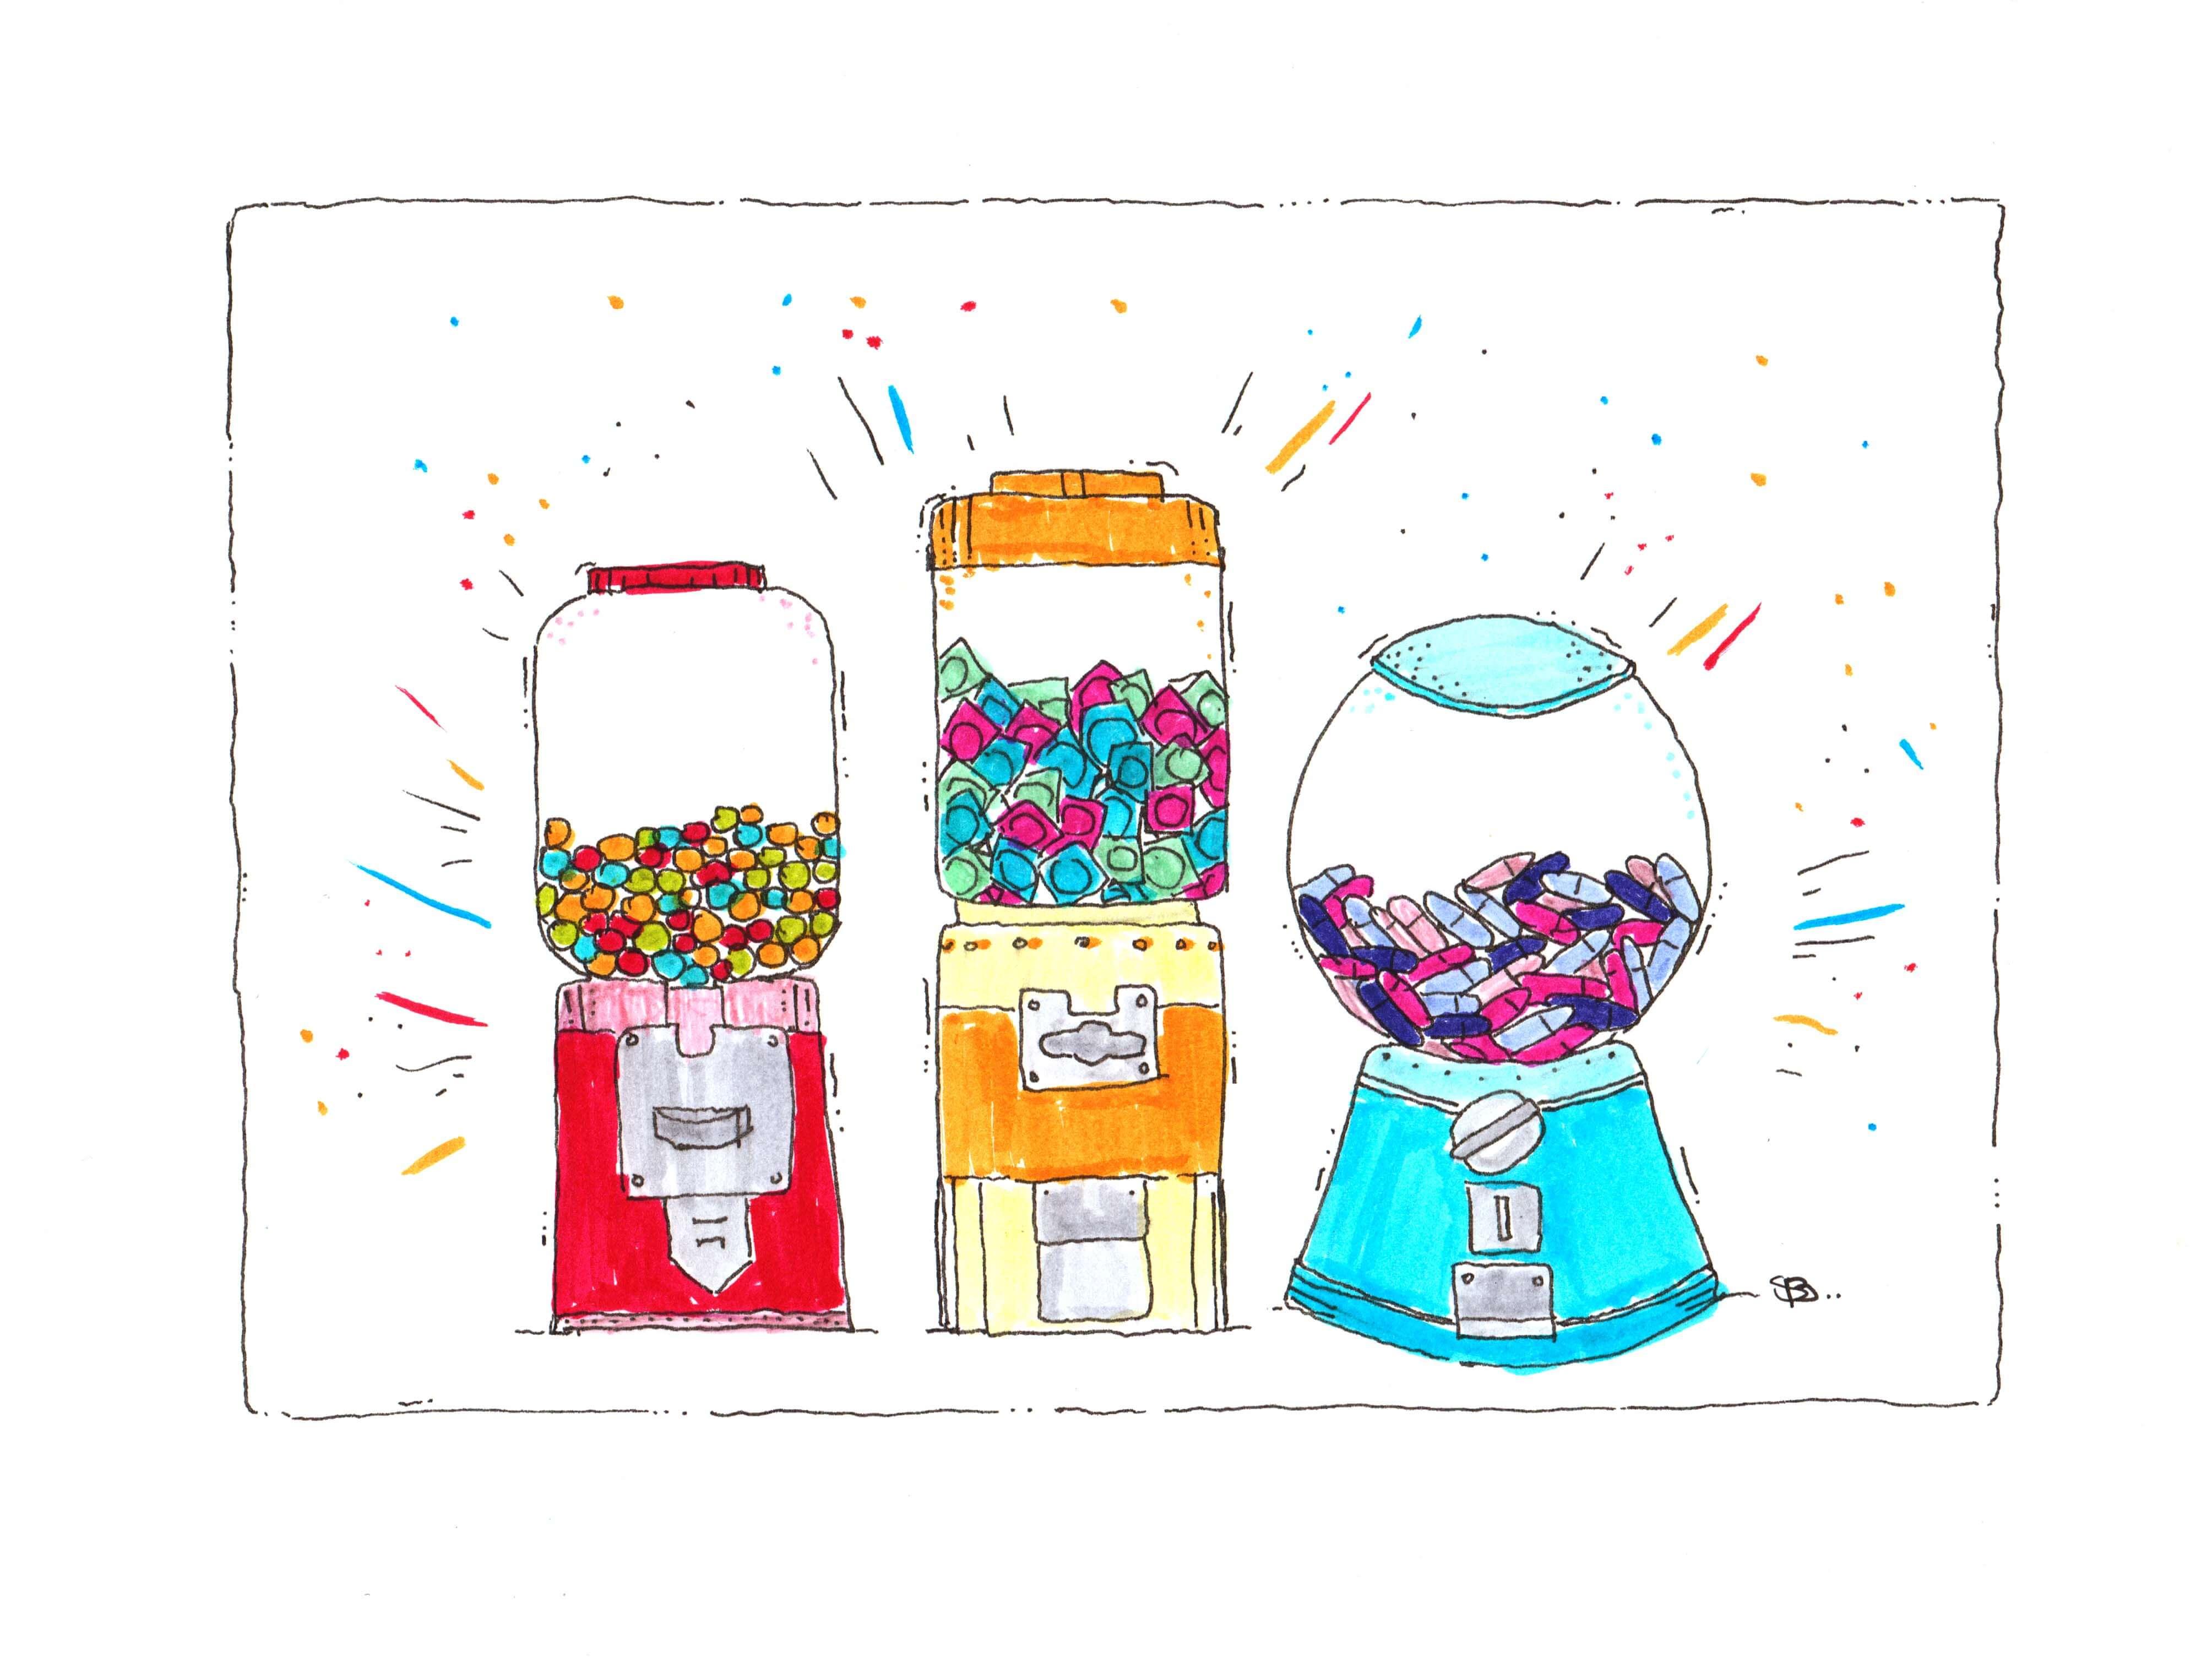 Kondom Automaten freitagsgeschichten